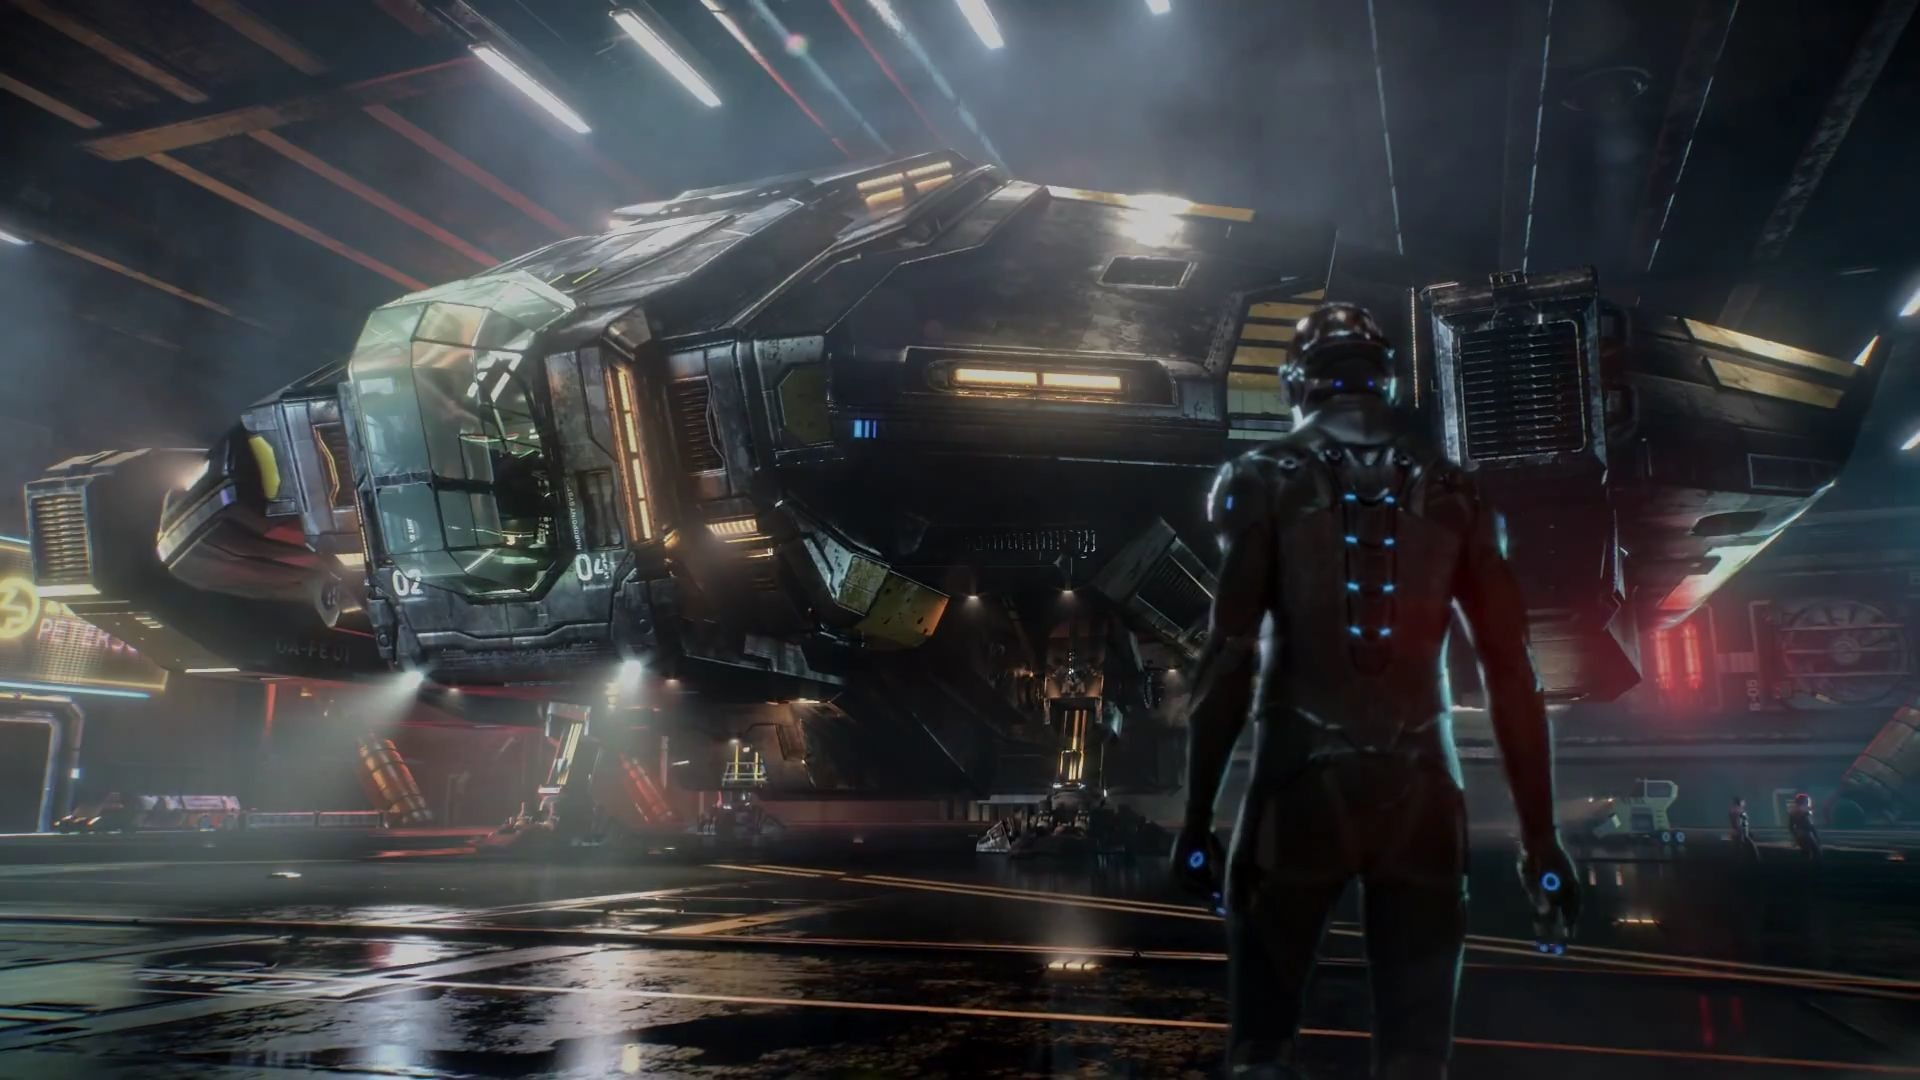 Watch The Elite: Dangerous Launch Trailer